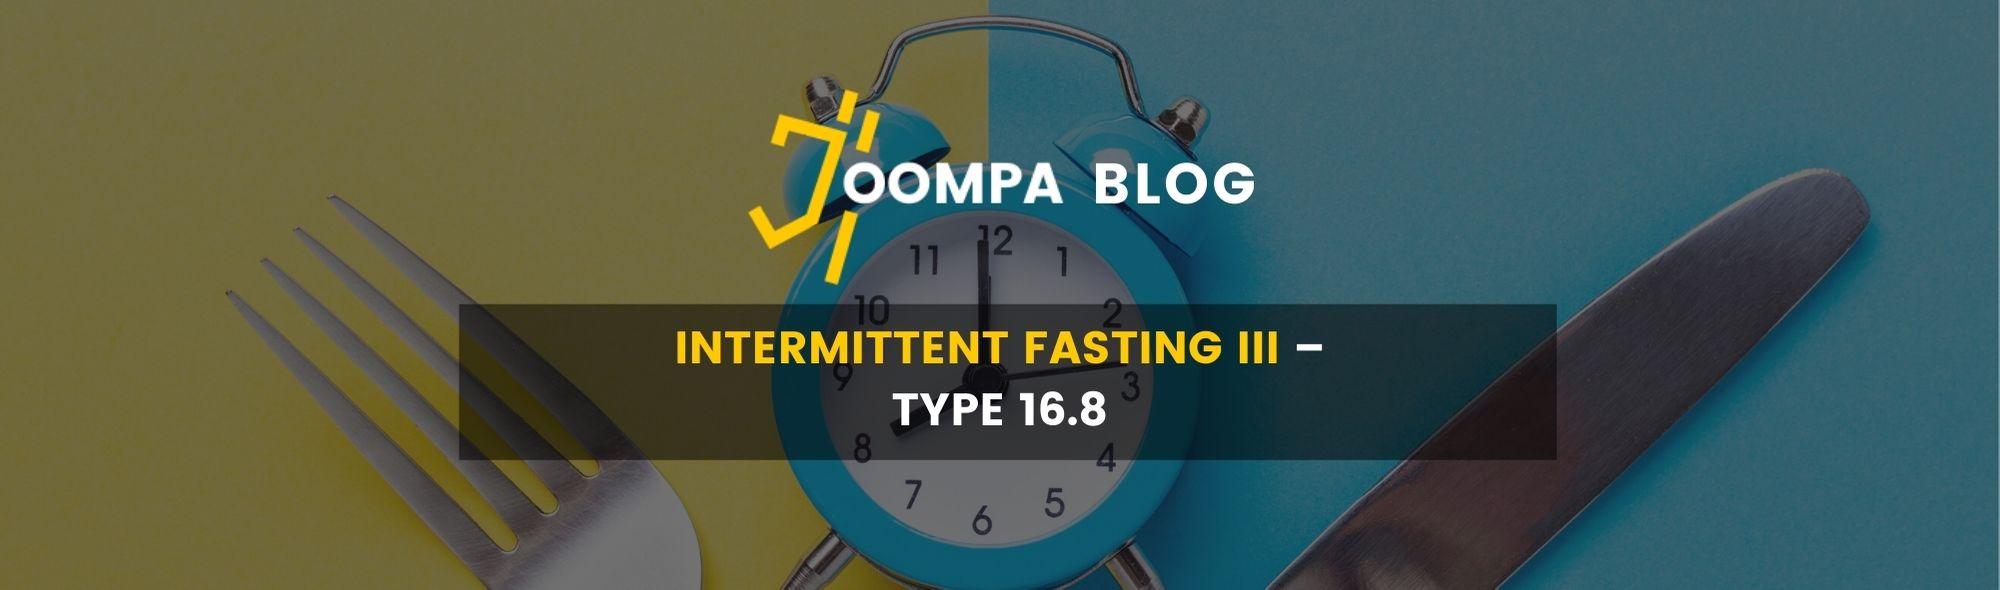 Intermittent Fasting III - Type 16.8